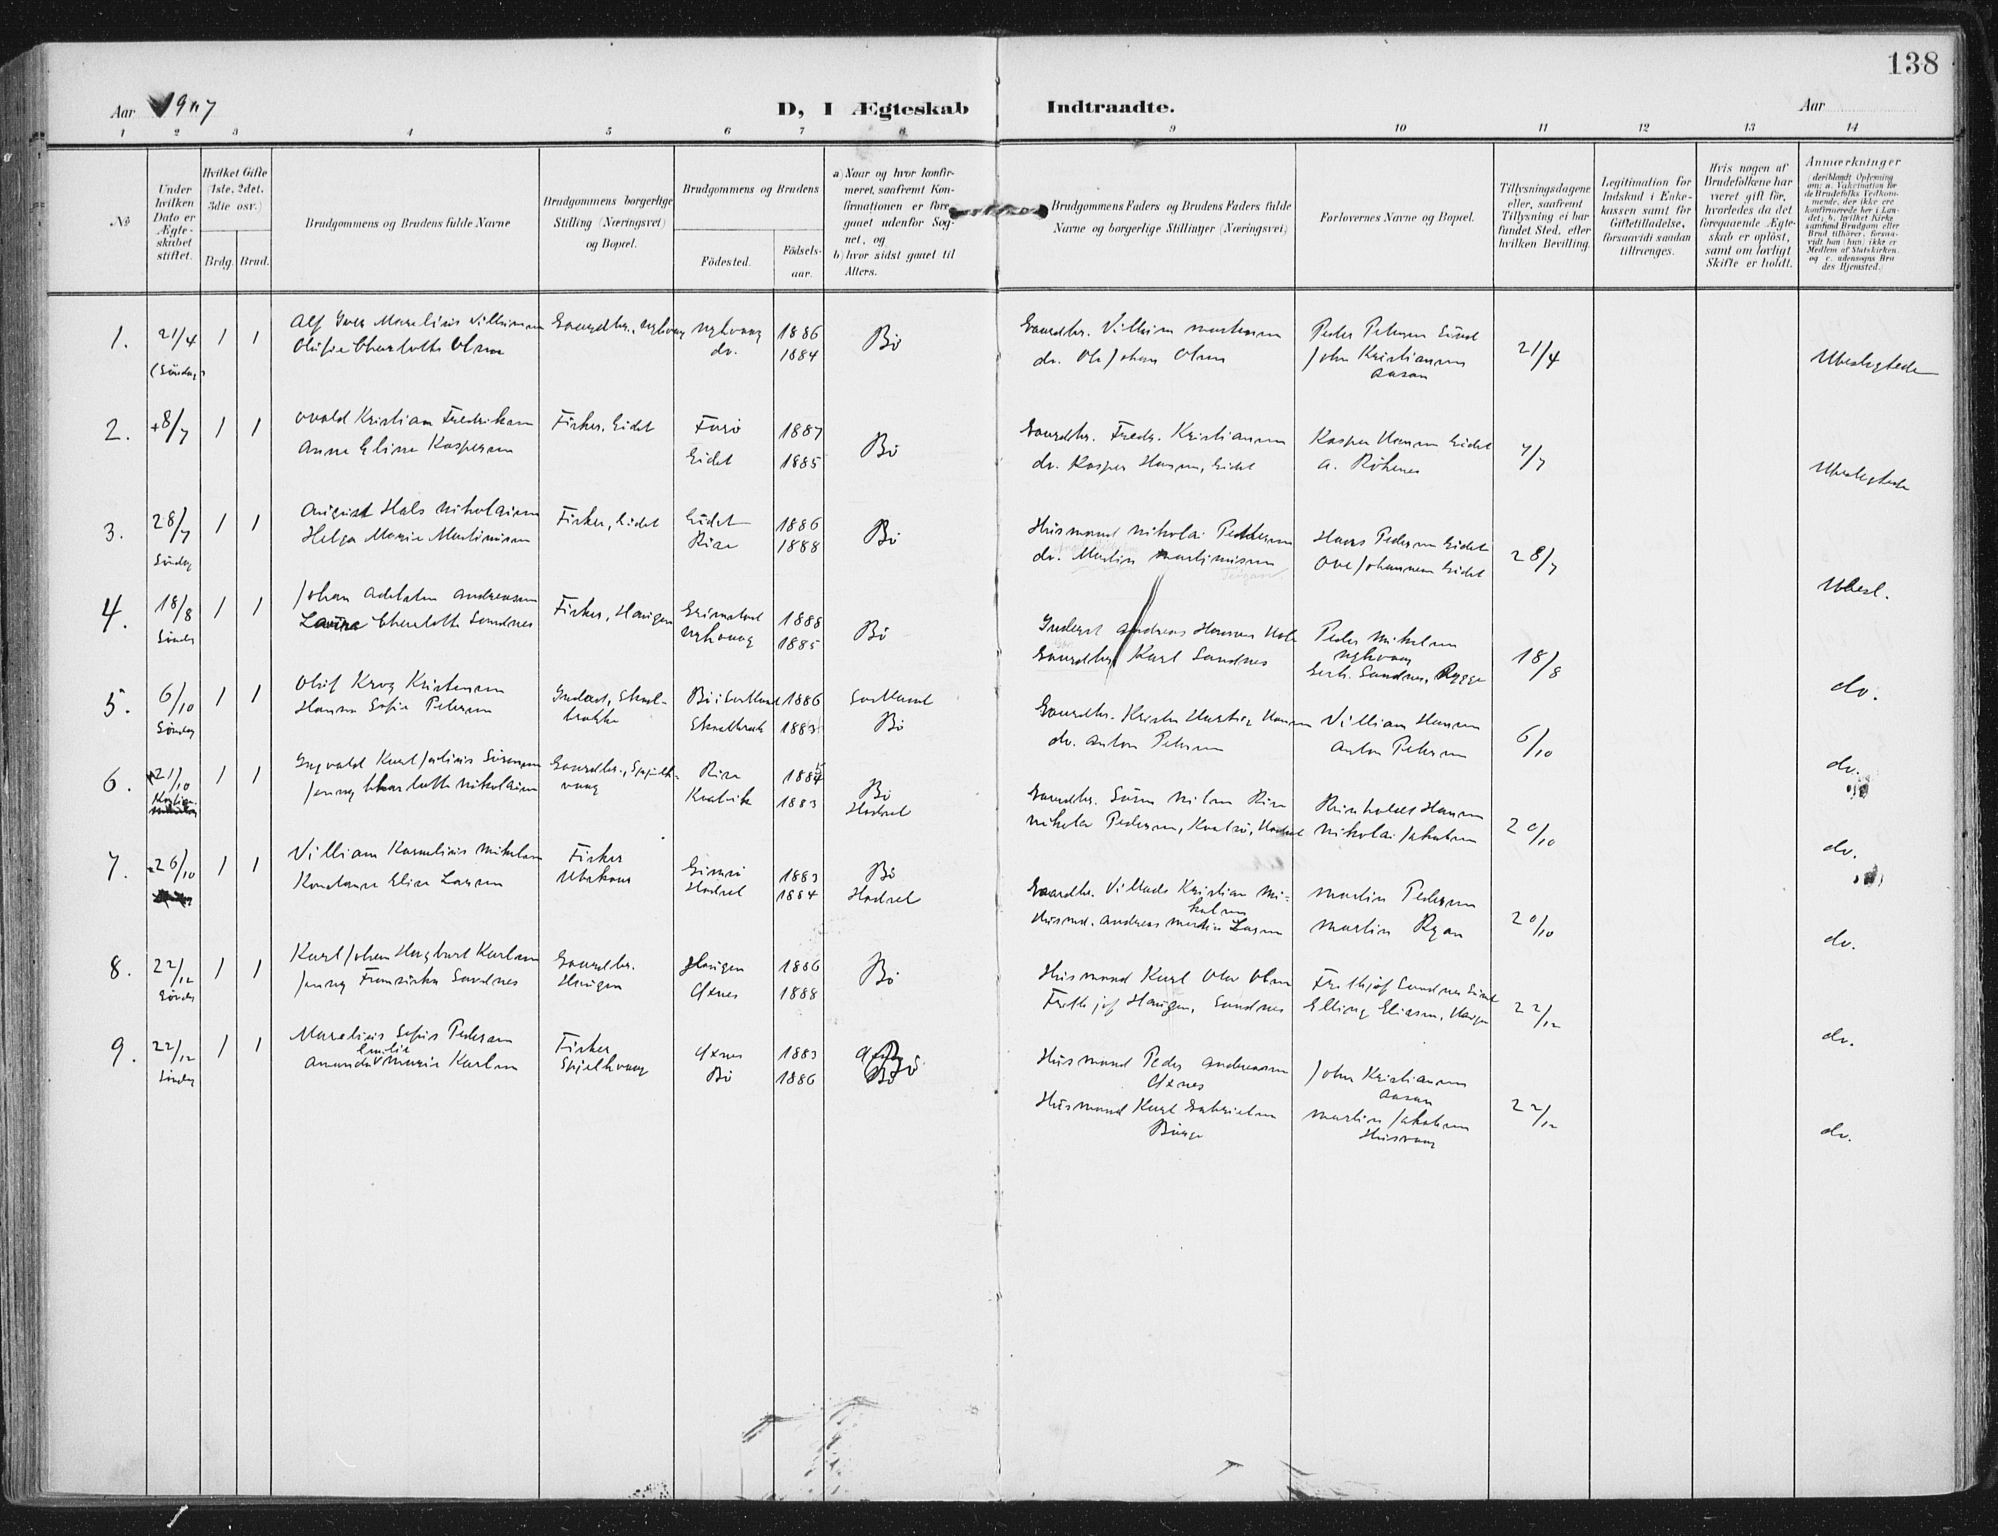 SAT, Ministerialprotokoller, klokkerbøker og fødselsregistre - Nordland, 892/L1321: Ministerialbok nr. 892A02, 1902-1918, s. 138